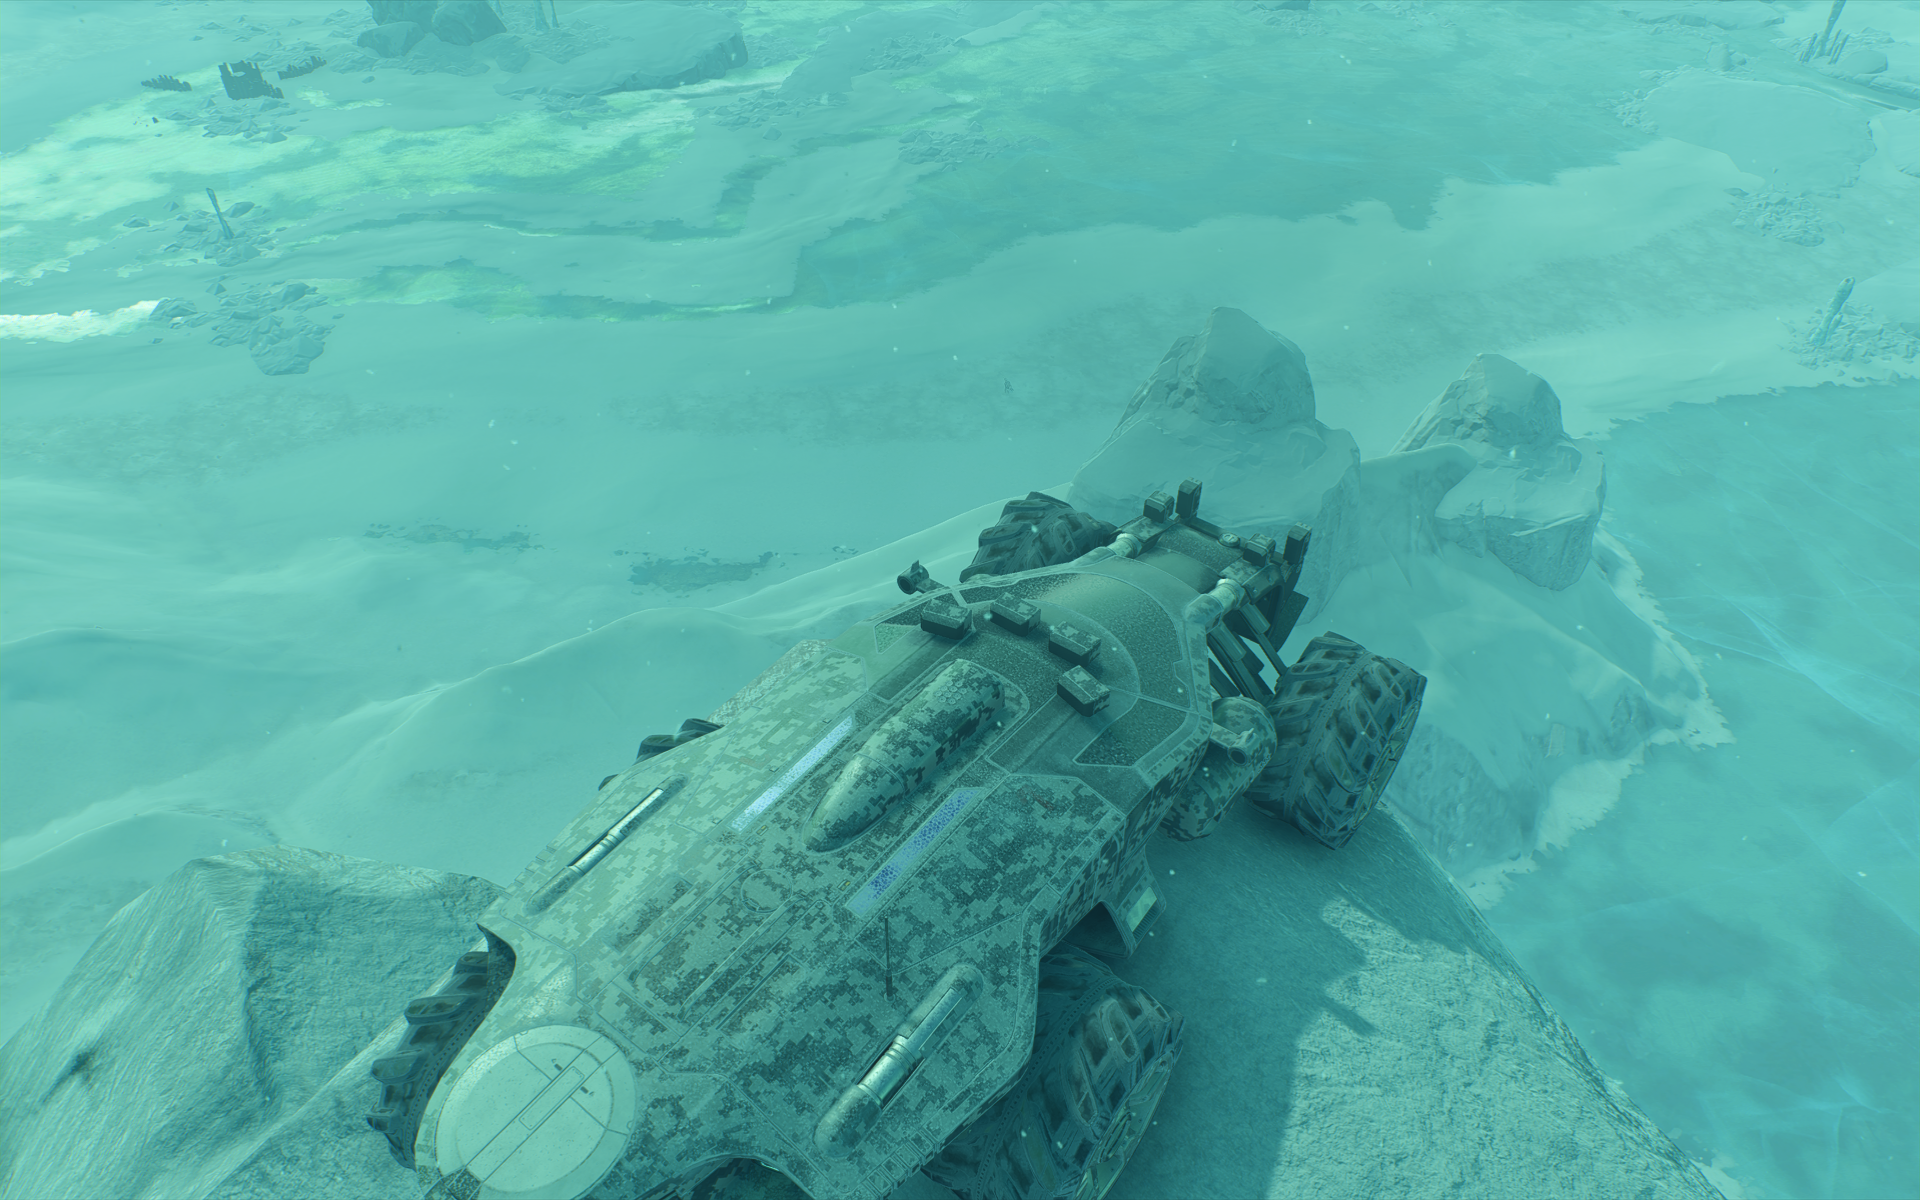 Mass Effect Andromeda Screenshot  - 15.31.08.15.png - Mass Effect: Andromeda